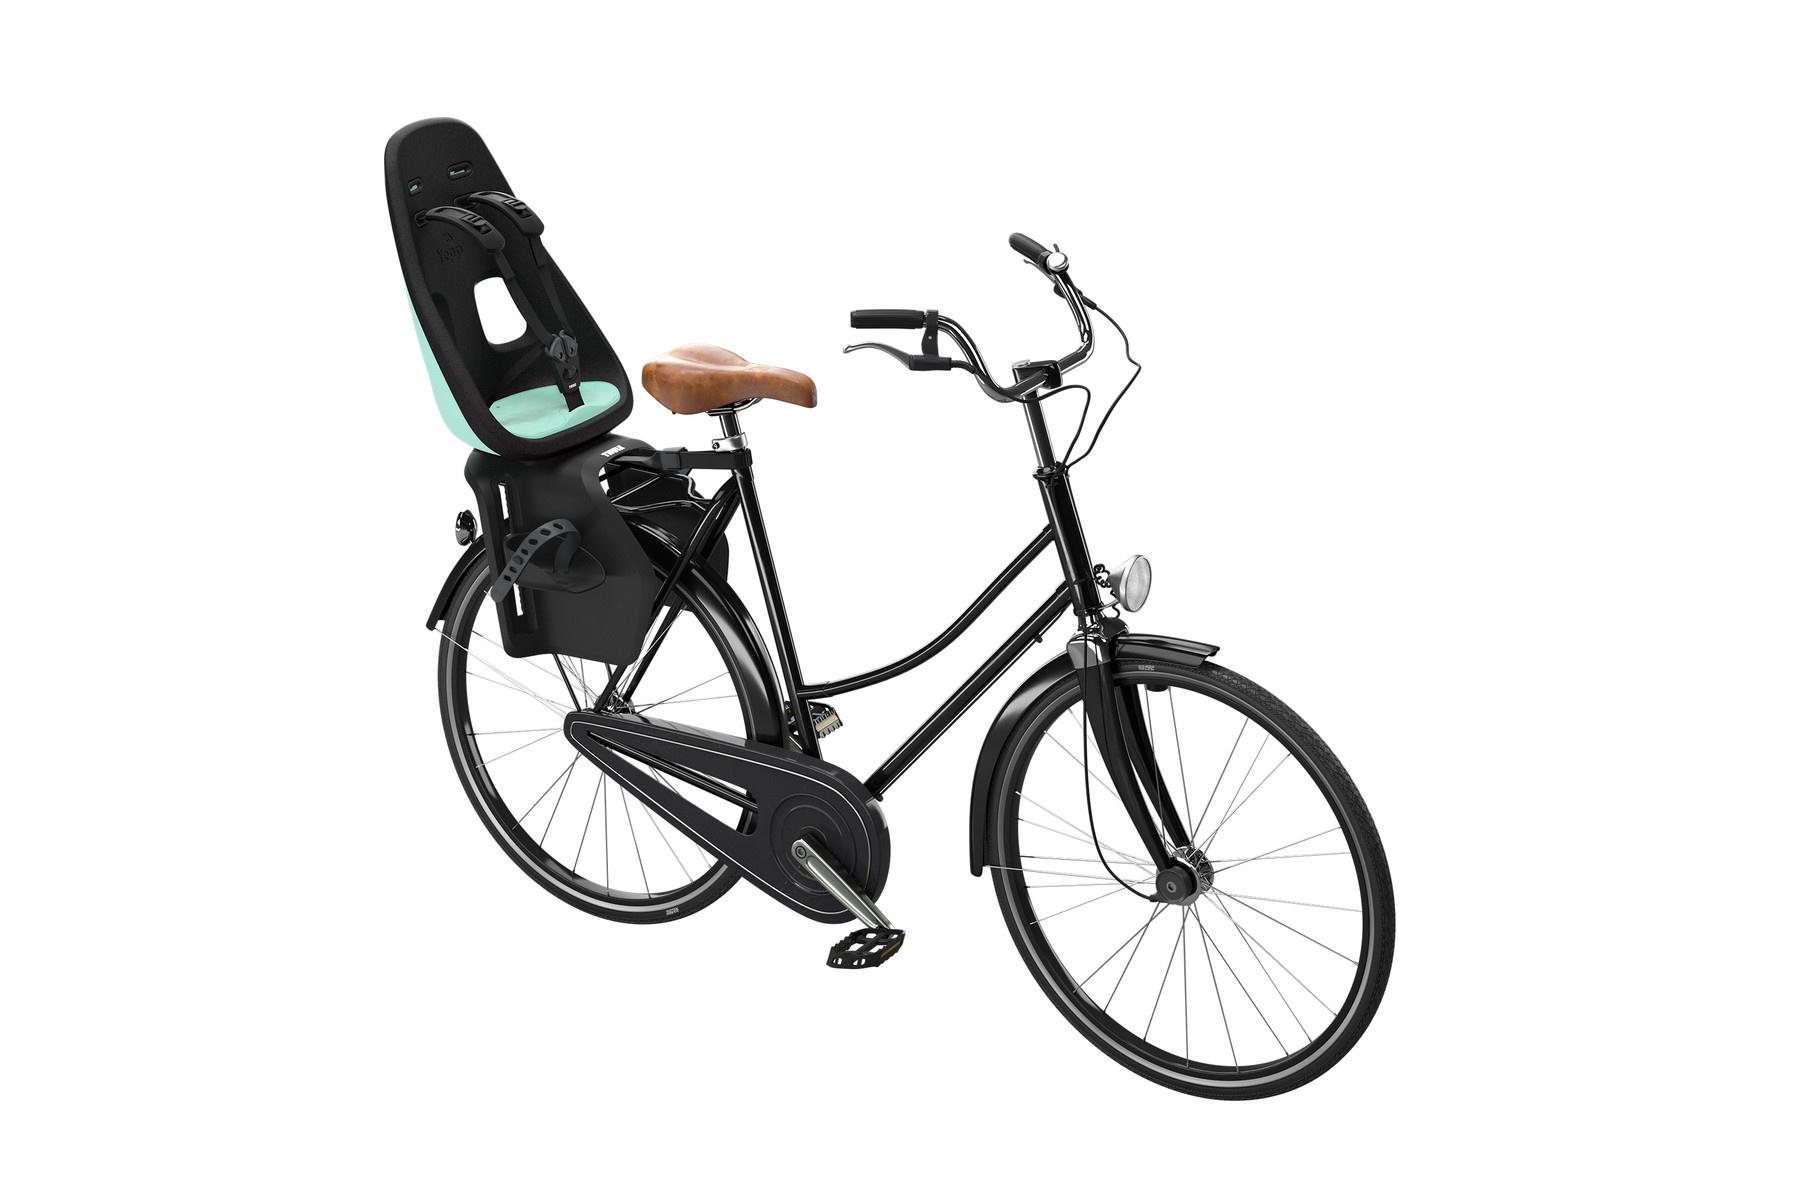 Thule Thule Yepp Nexxt Maxi Rack Mount Child Seat